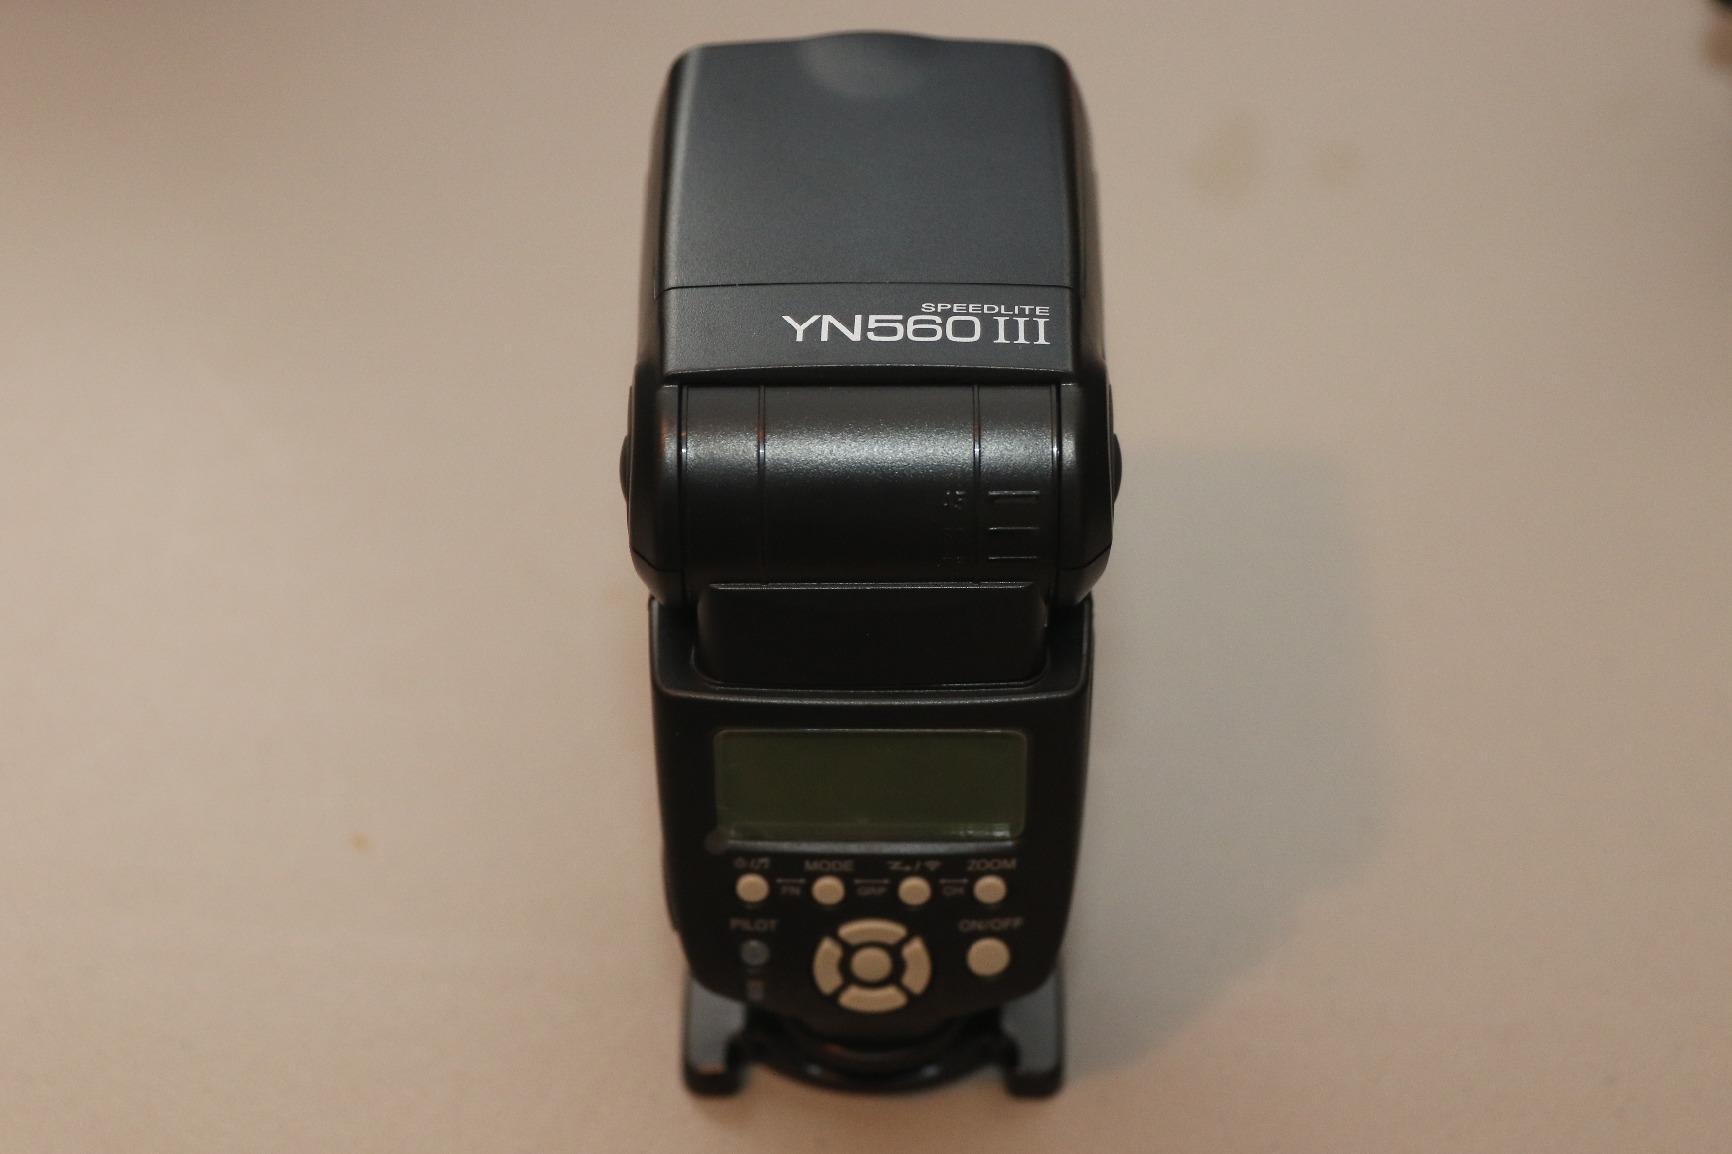 yongnuo flash 560 iii manual